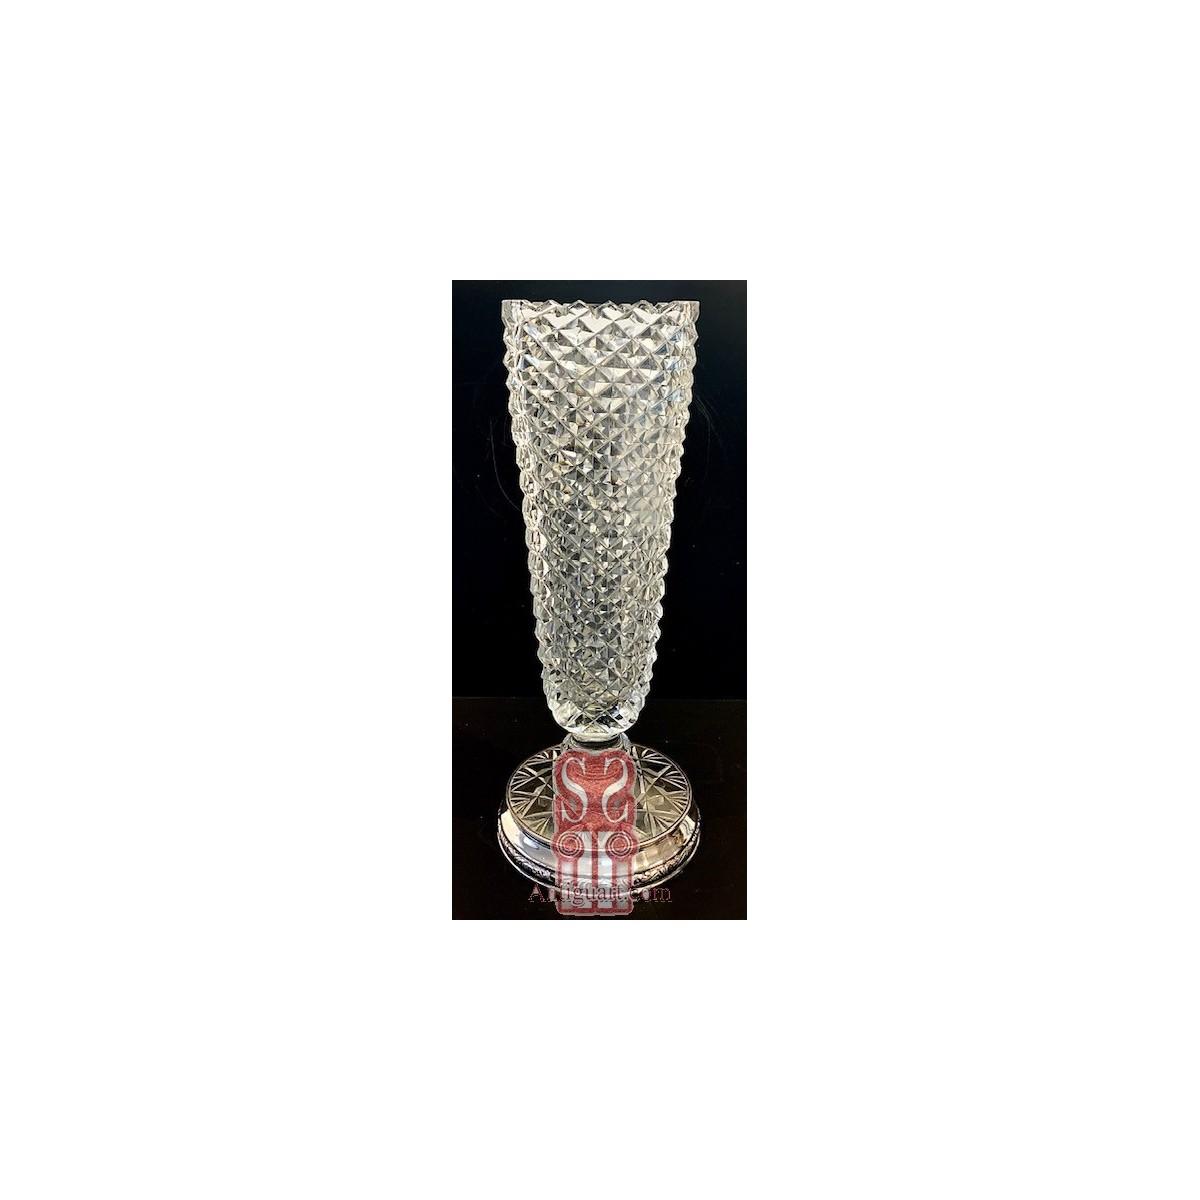 Triangular glass vase mid-20th